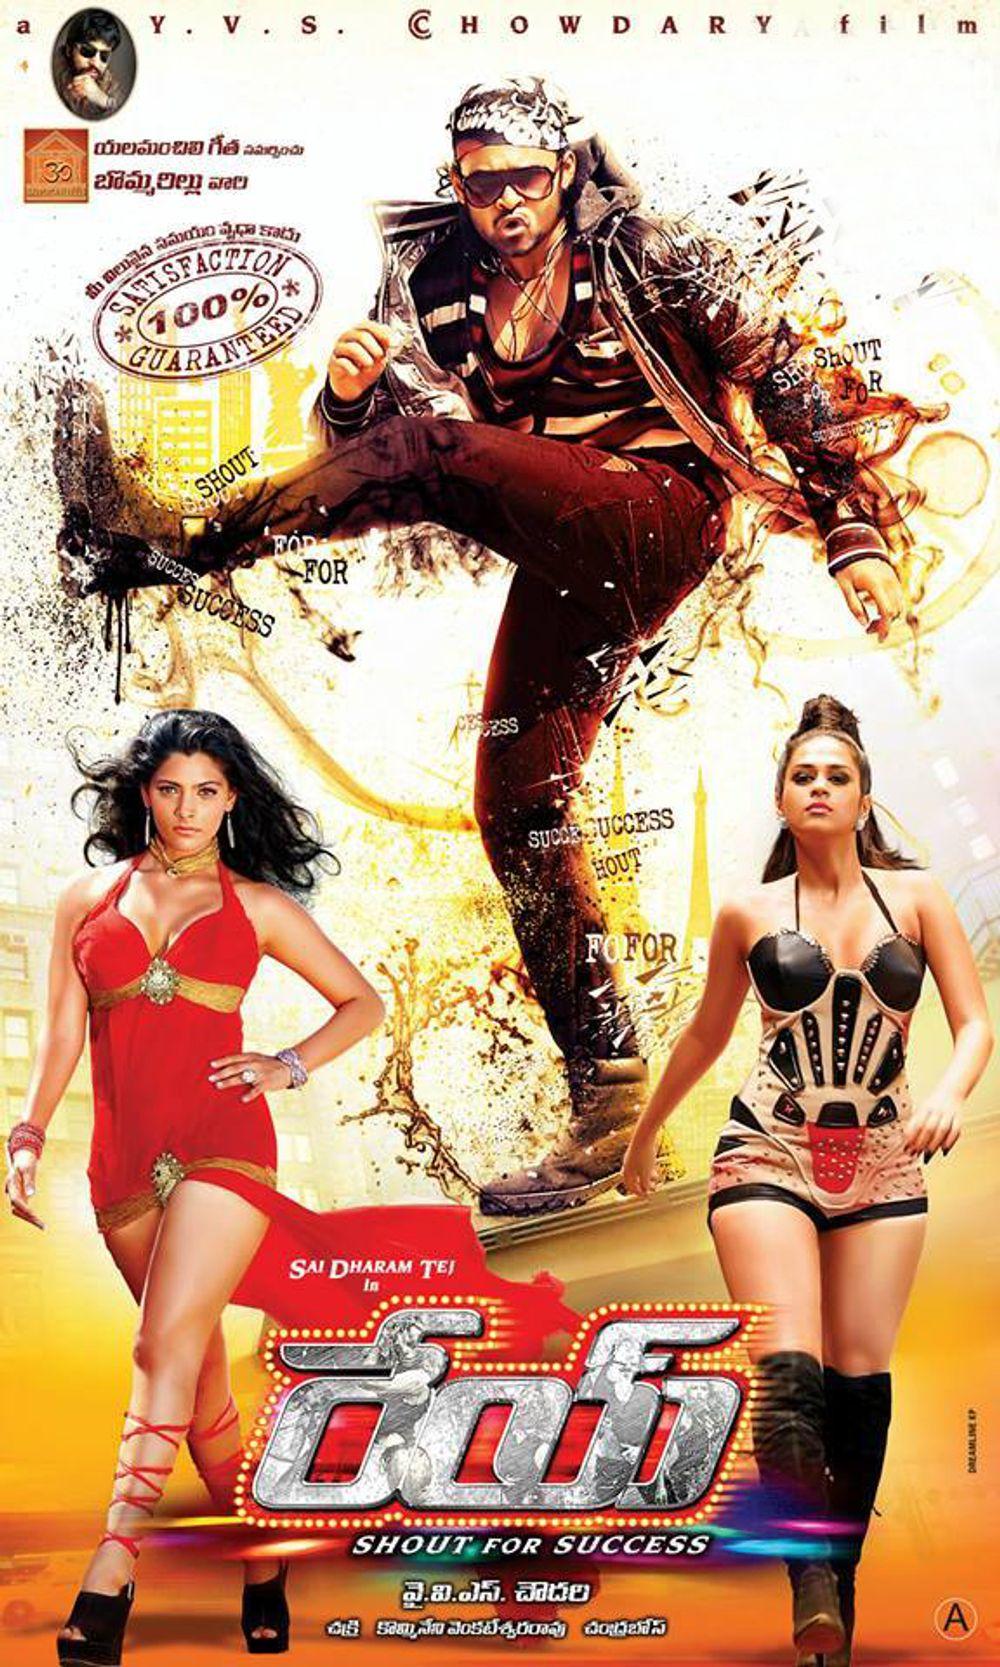 Rey (2021) Hindi Dubbed Movie HDRip 720p AAC